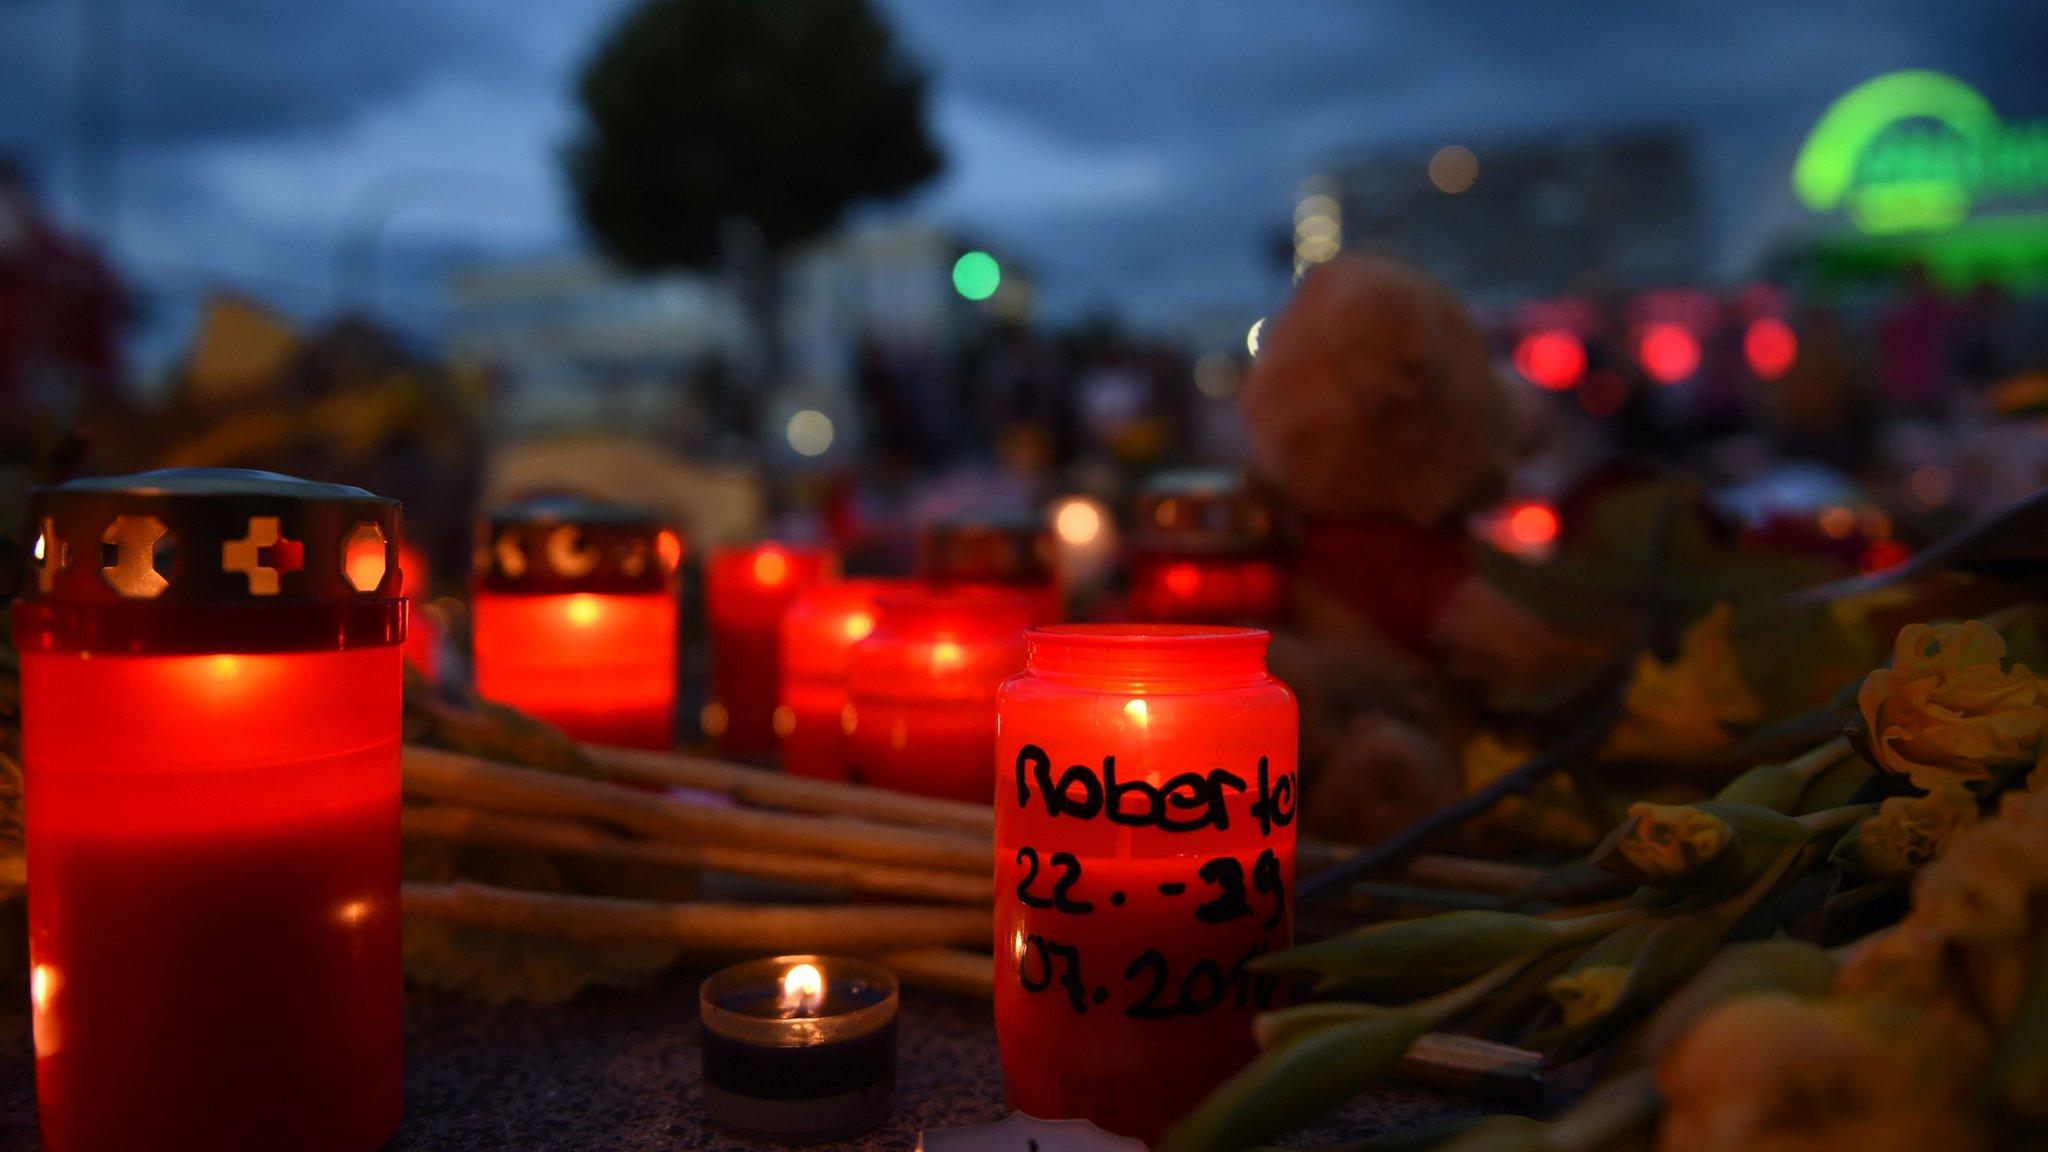 Munich shootings: Police arrest 16-year-old Afghan